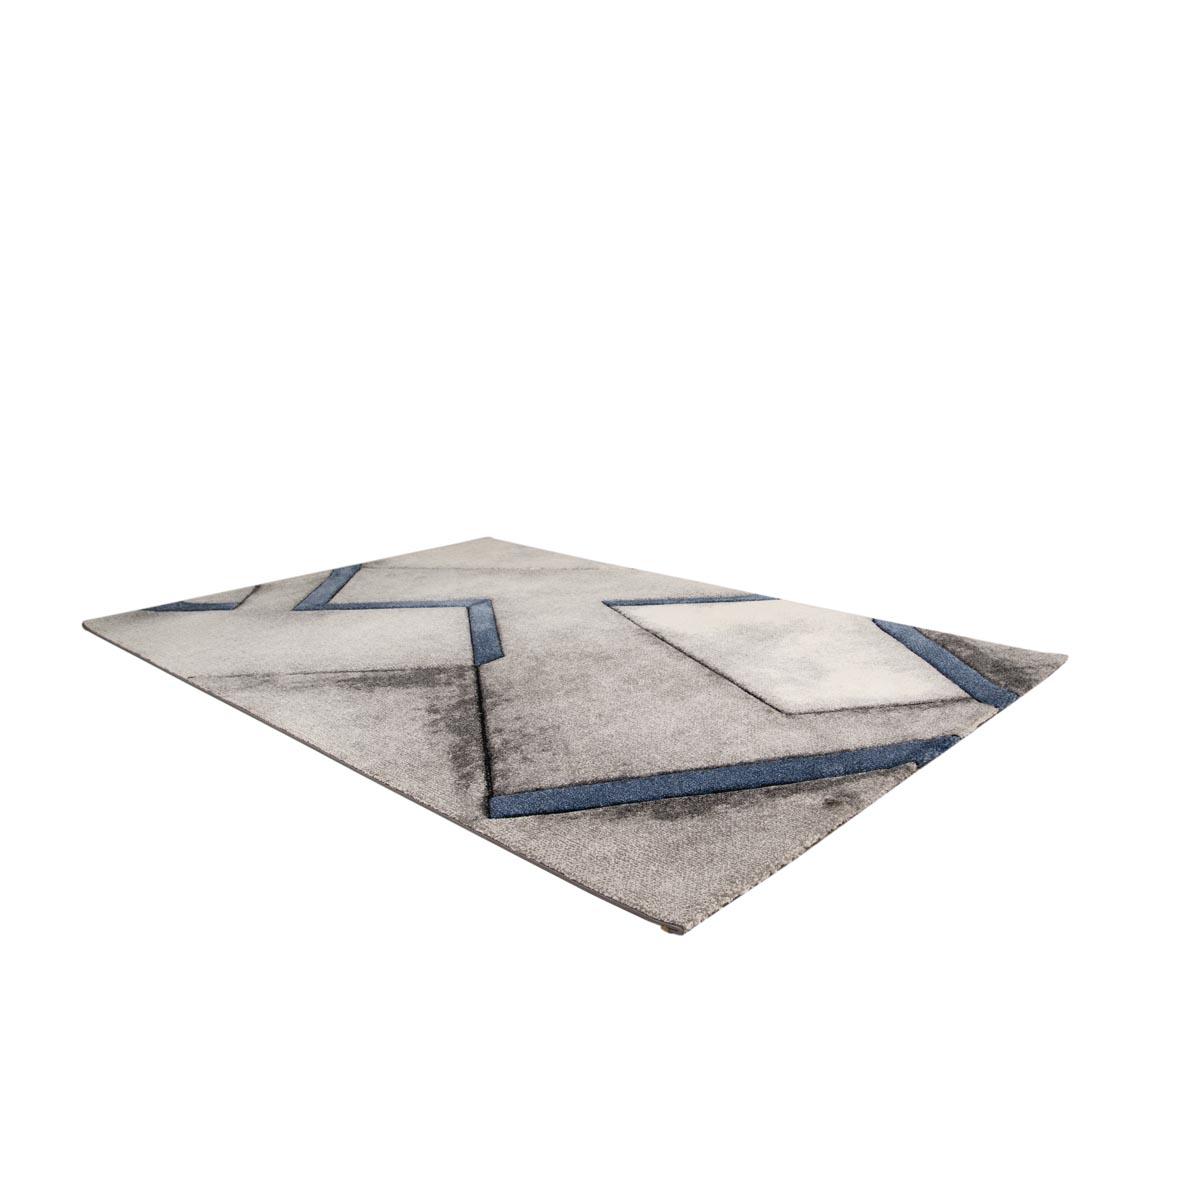 Le Clear matta mönstrad liggande